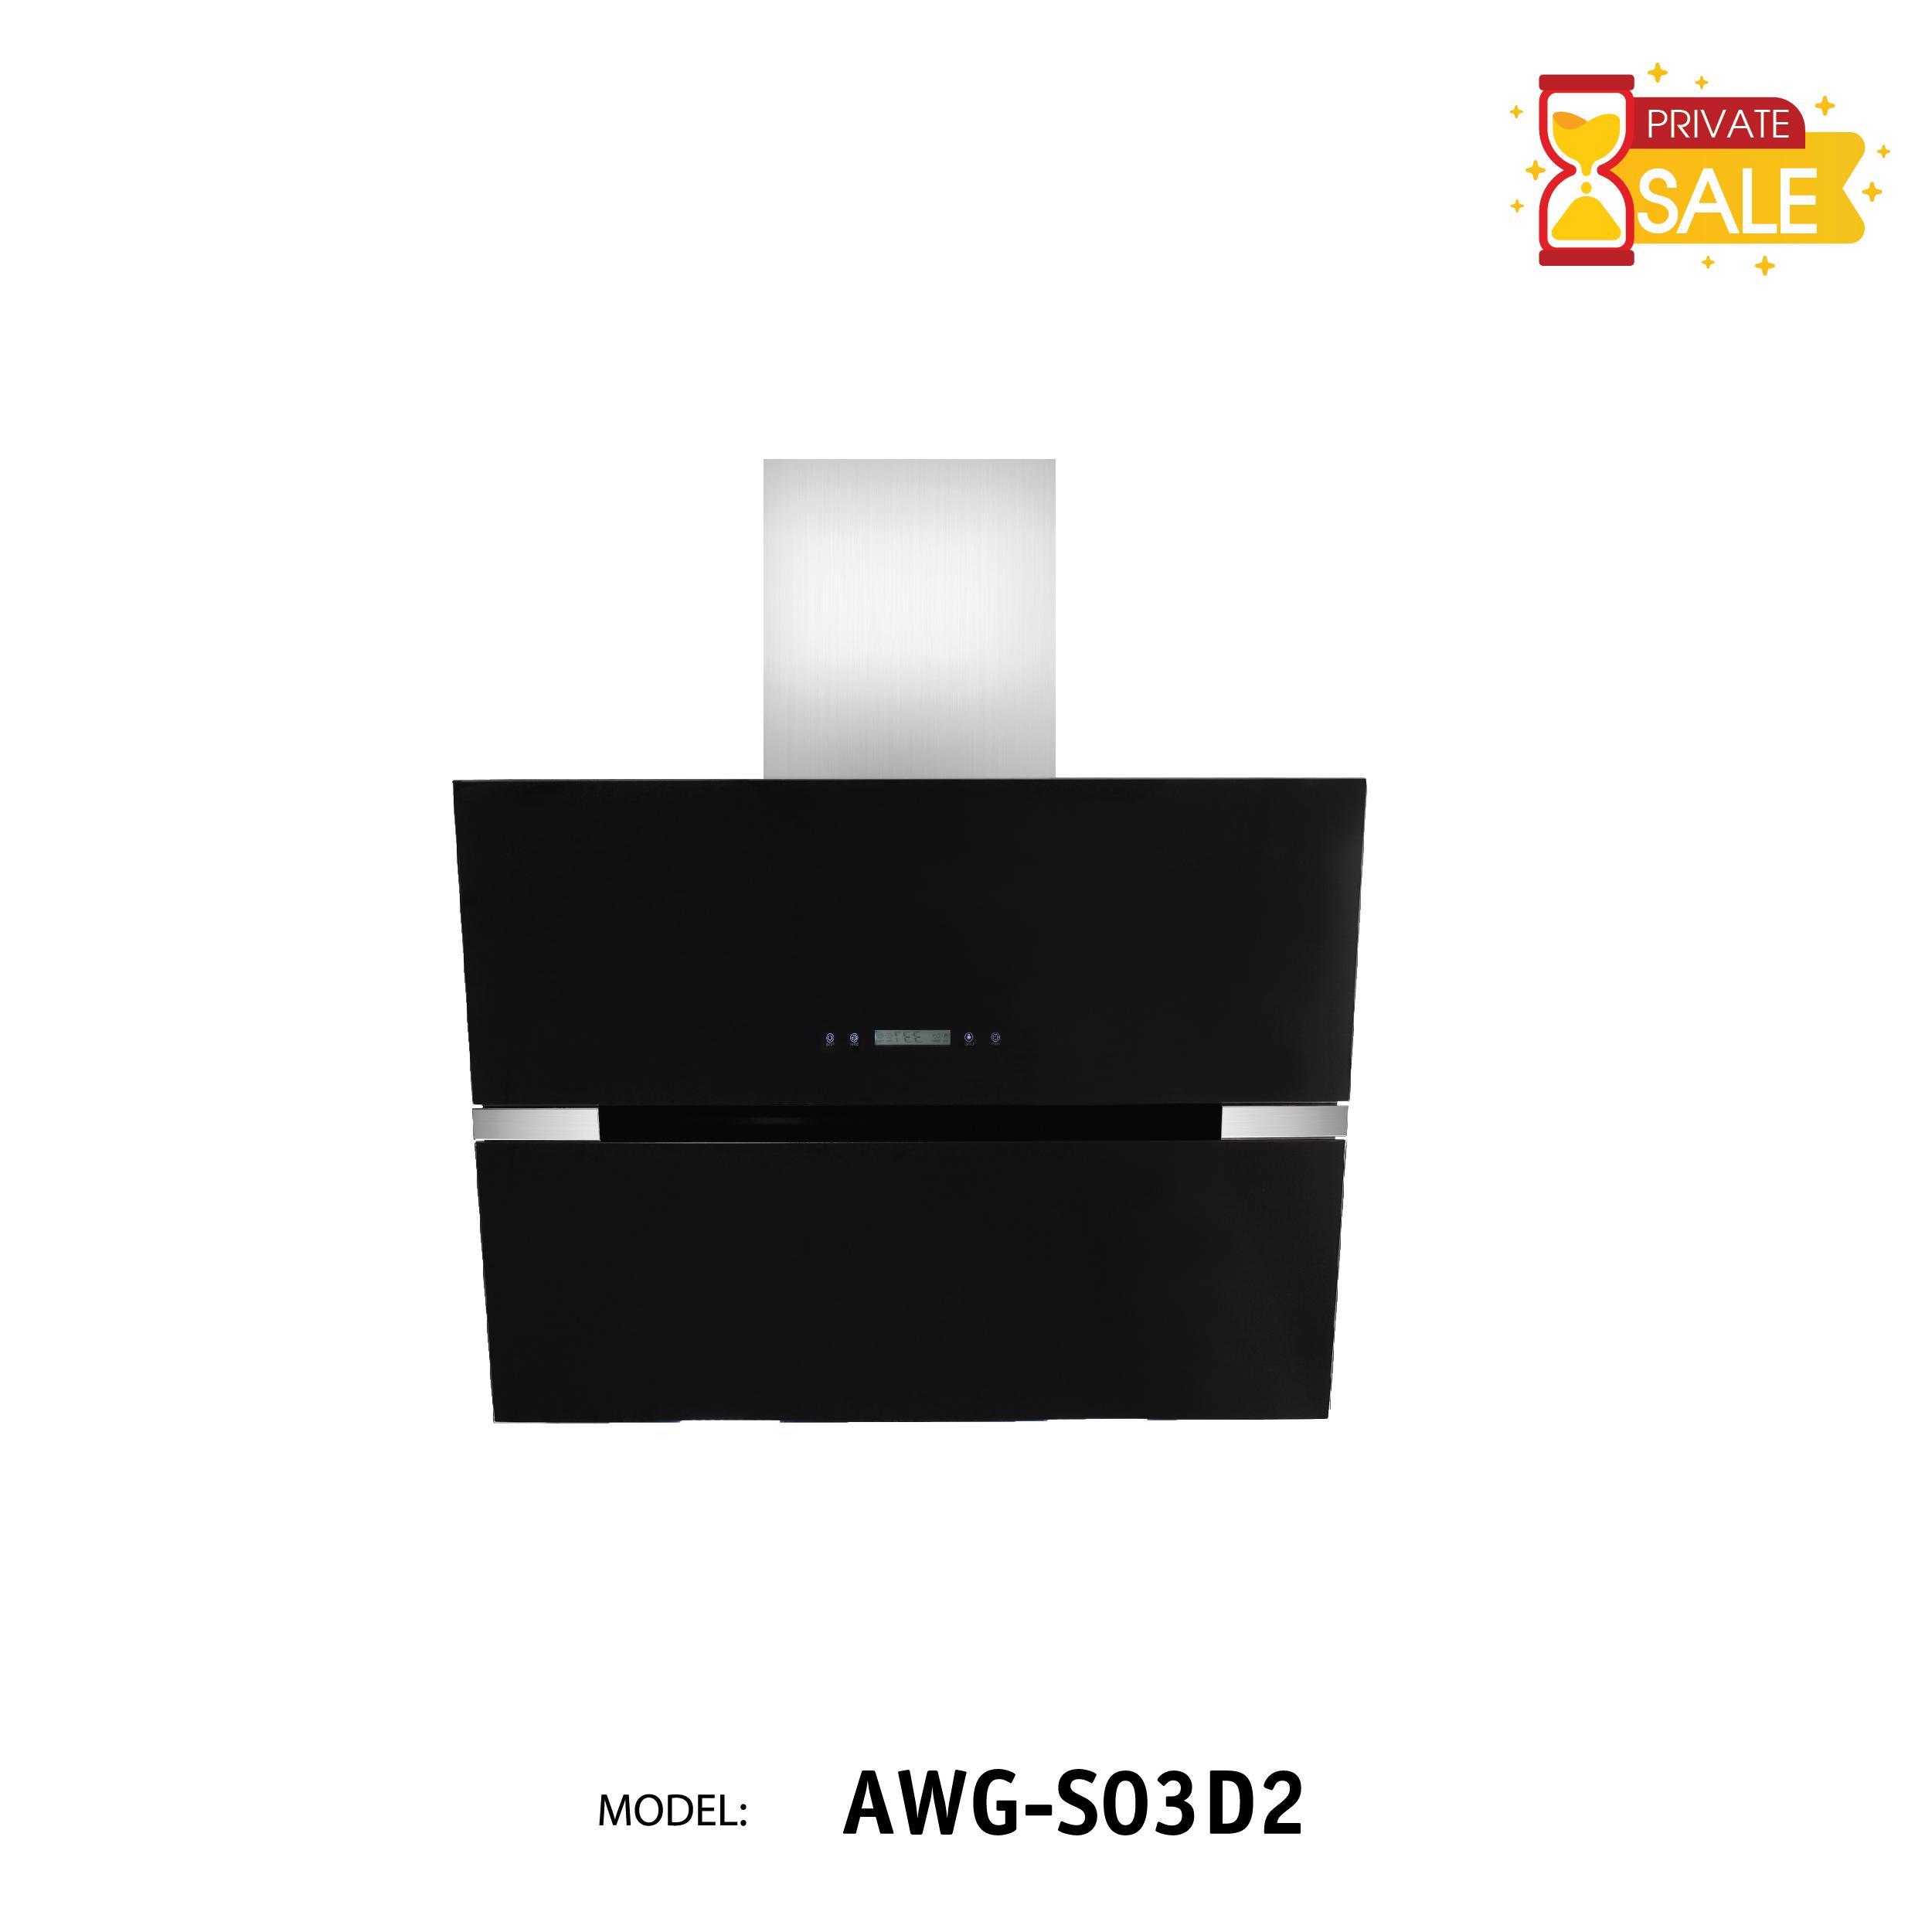 Máy hút mùi áp tường Birillo - Model AWGS03D2